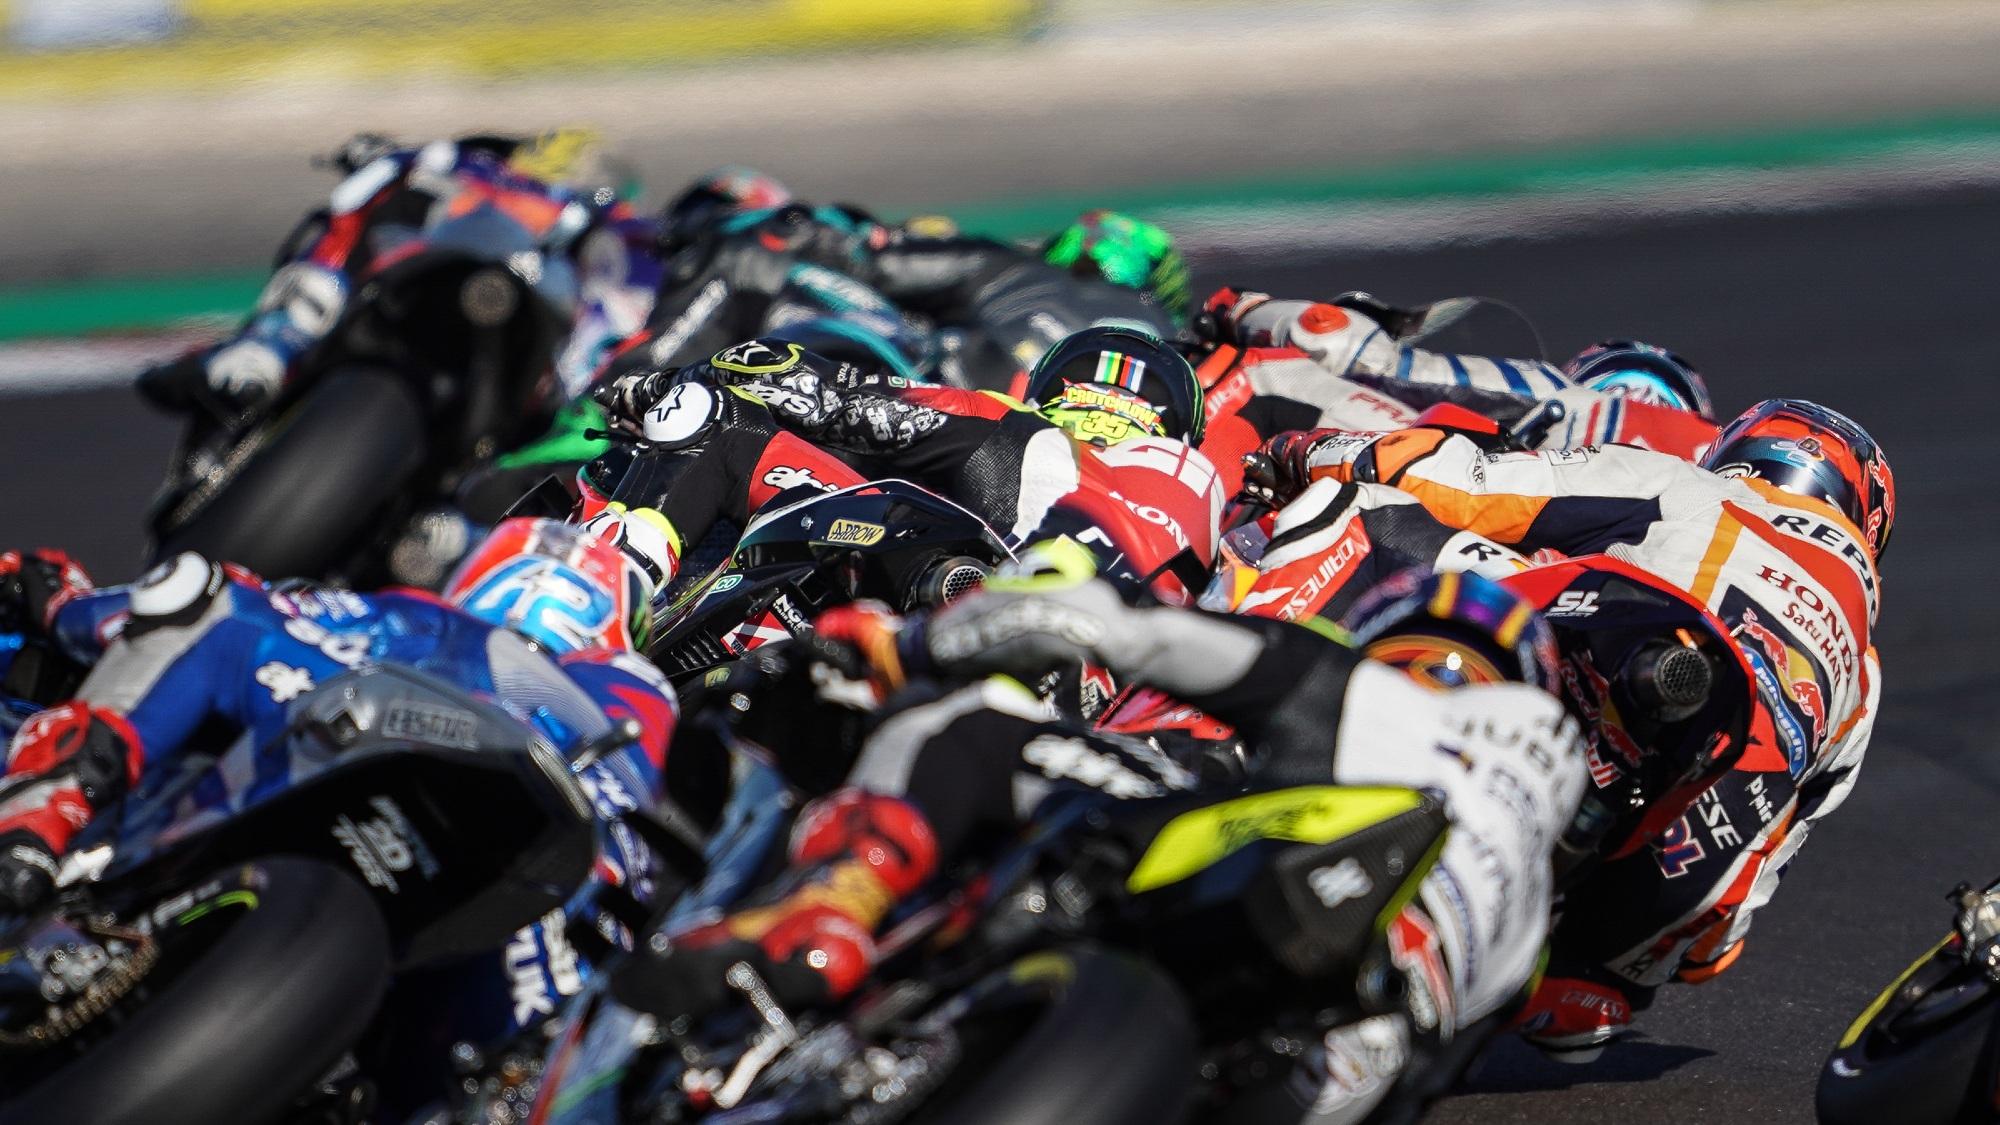 The real reason MotoGP 2020 was so close and unpredictable